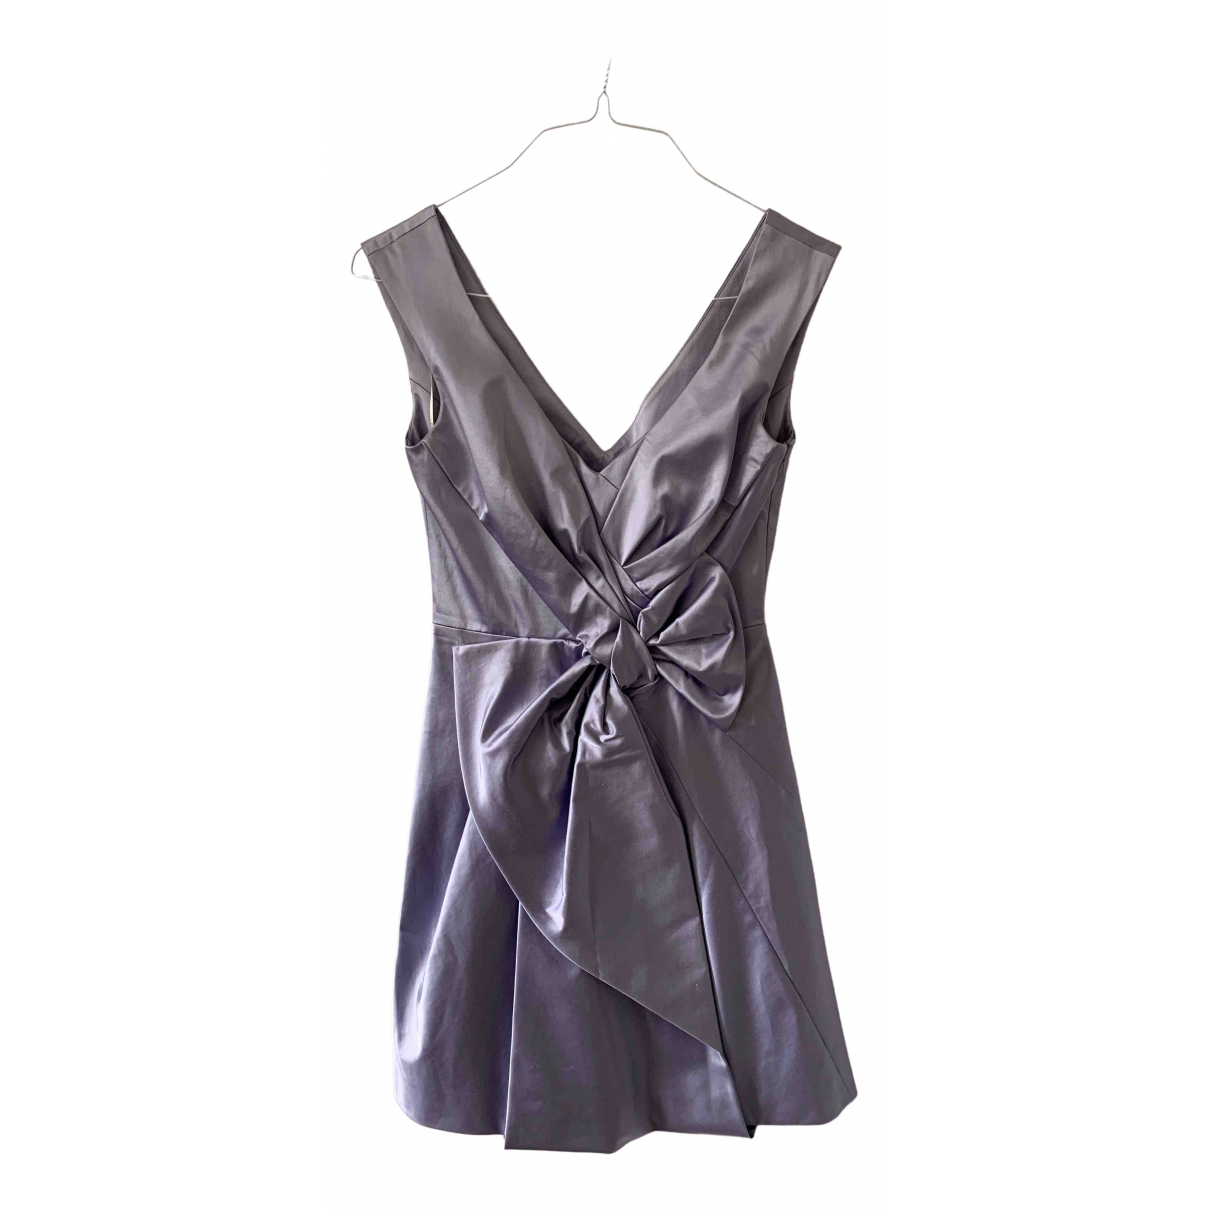 Karen Millen \N Cotton dress for Women 8 UK